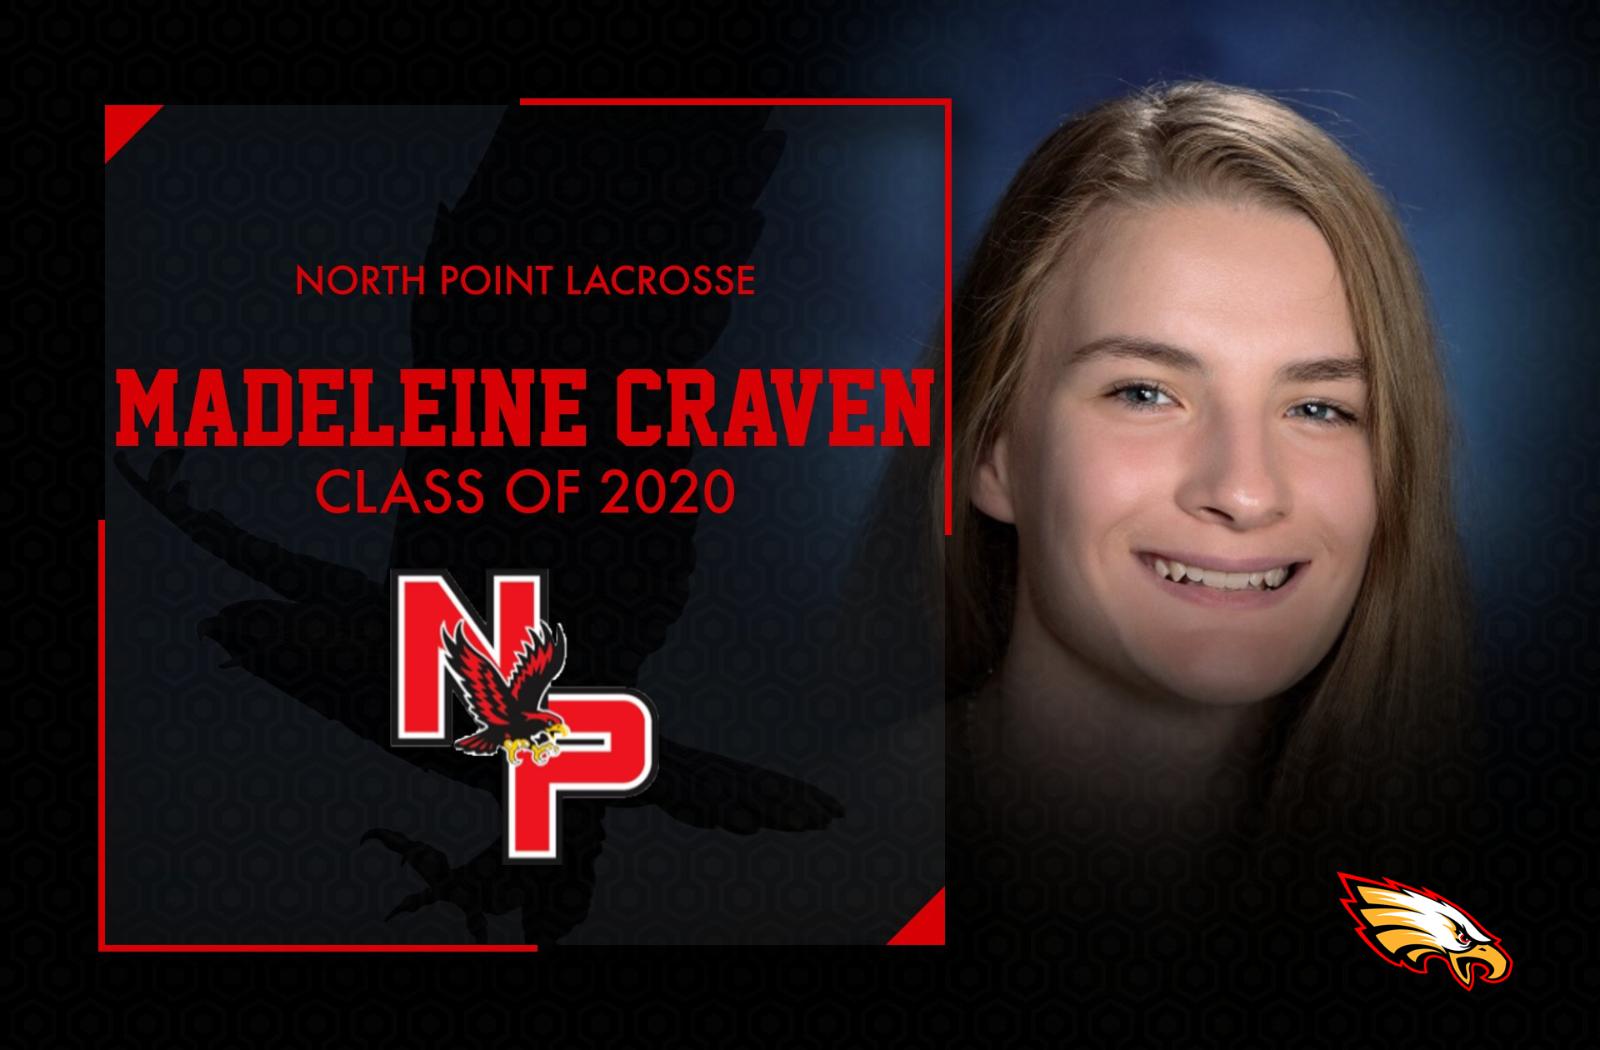 Class of 2020- Madeleine Craven, Lacrosse